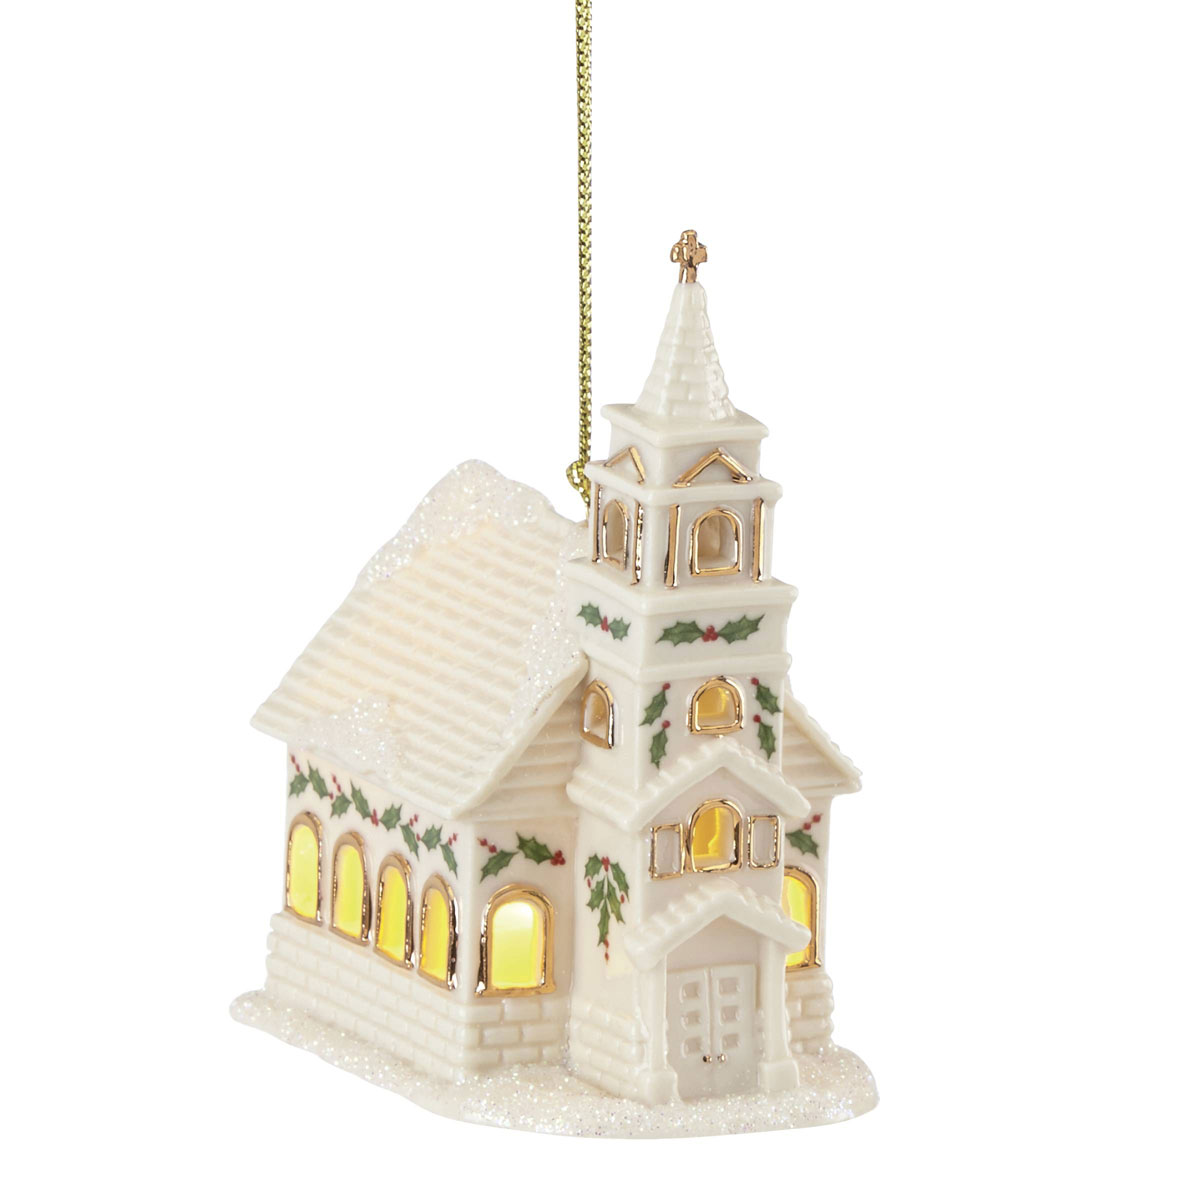 Lenox 2021 Christmas Village Lit Church Ornament